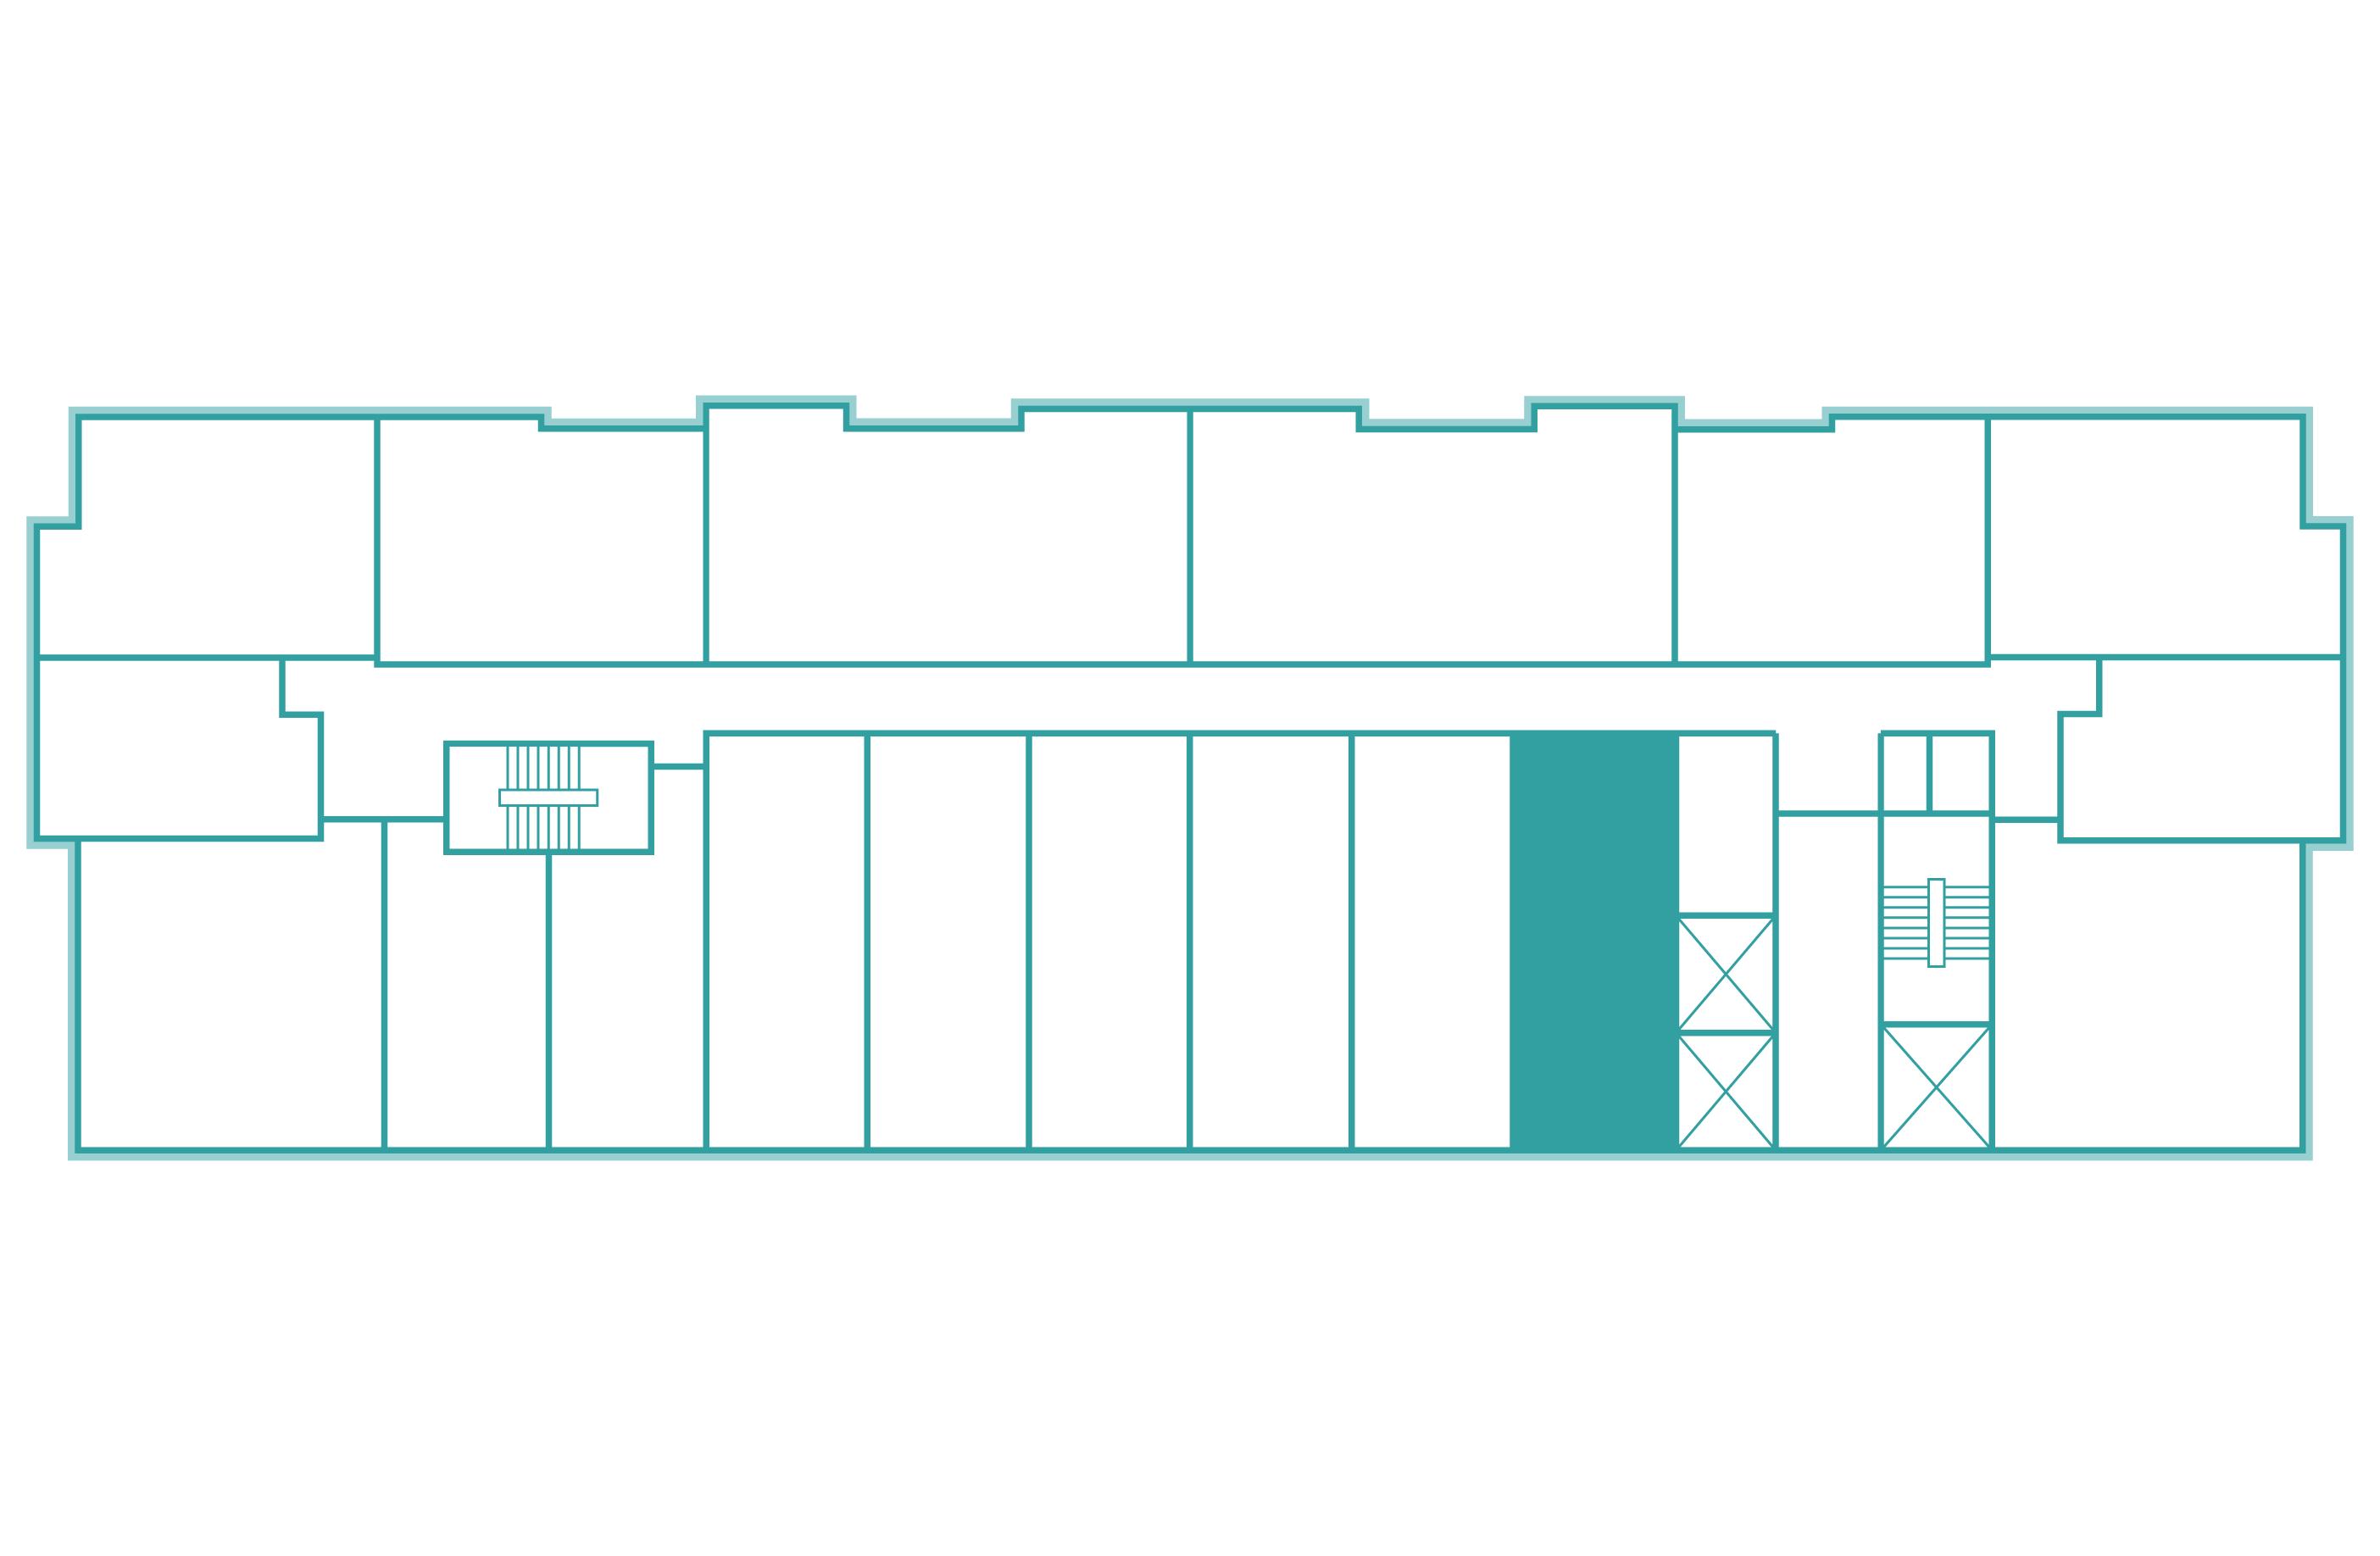 floorplan image of unit image 0401